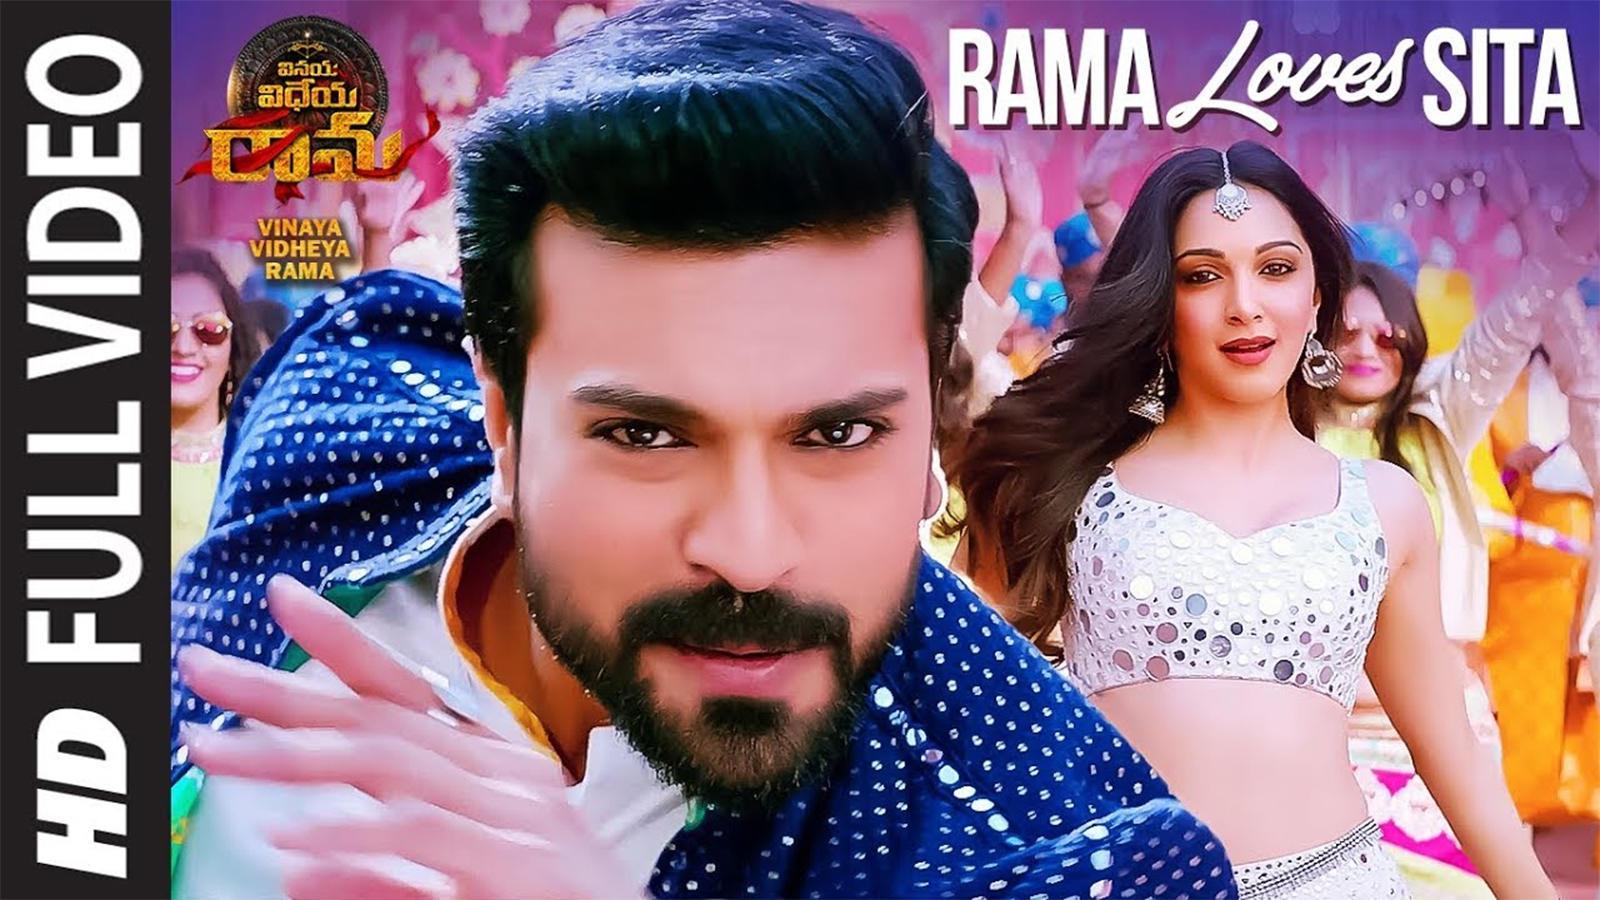 Vinaya Vidheya Rama | Song - Rama Loves Seeta